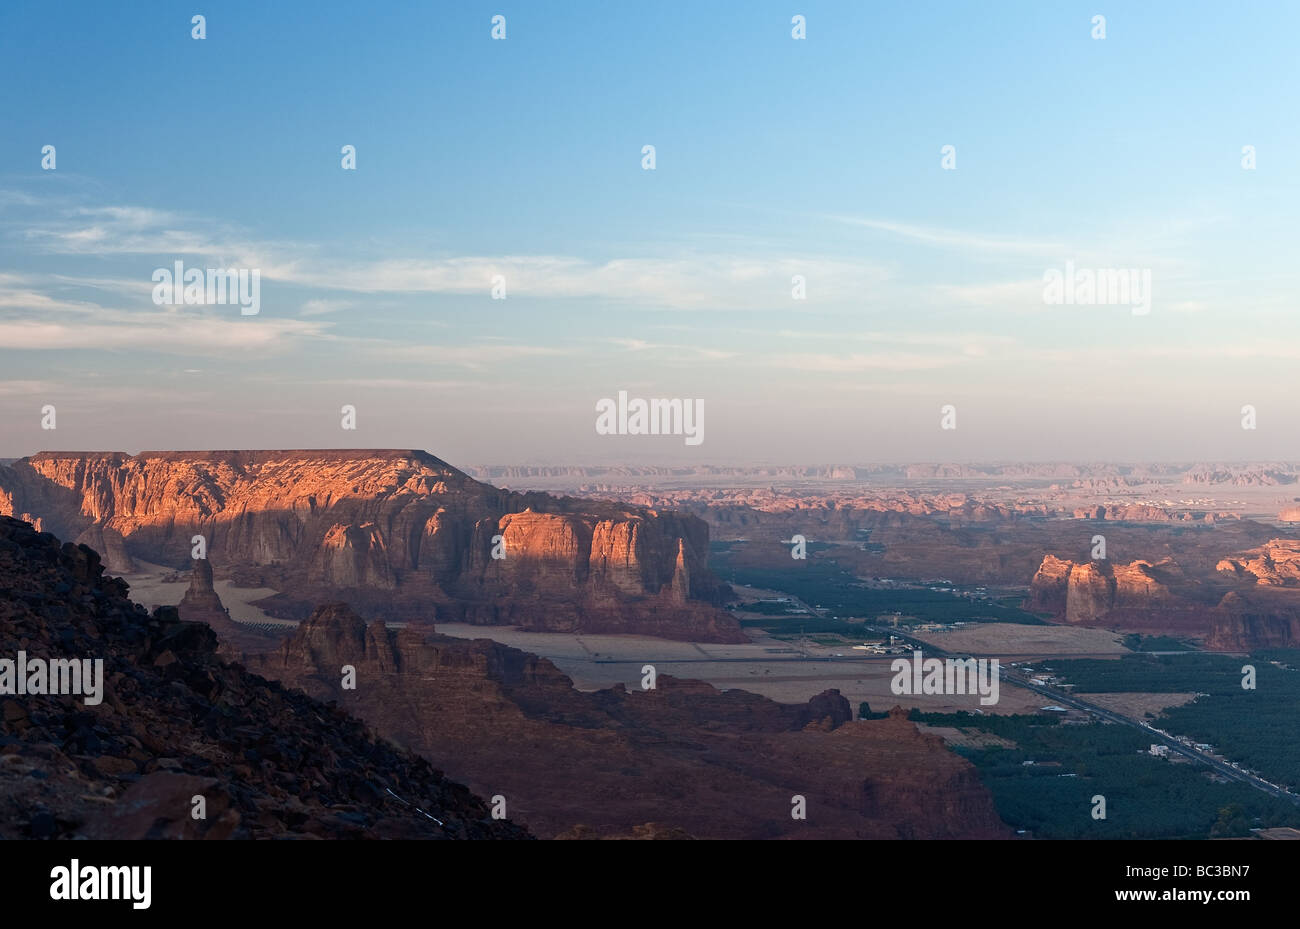 Suset on Madain Saleh valley - Stock Image